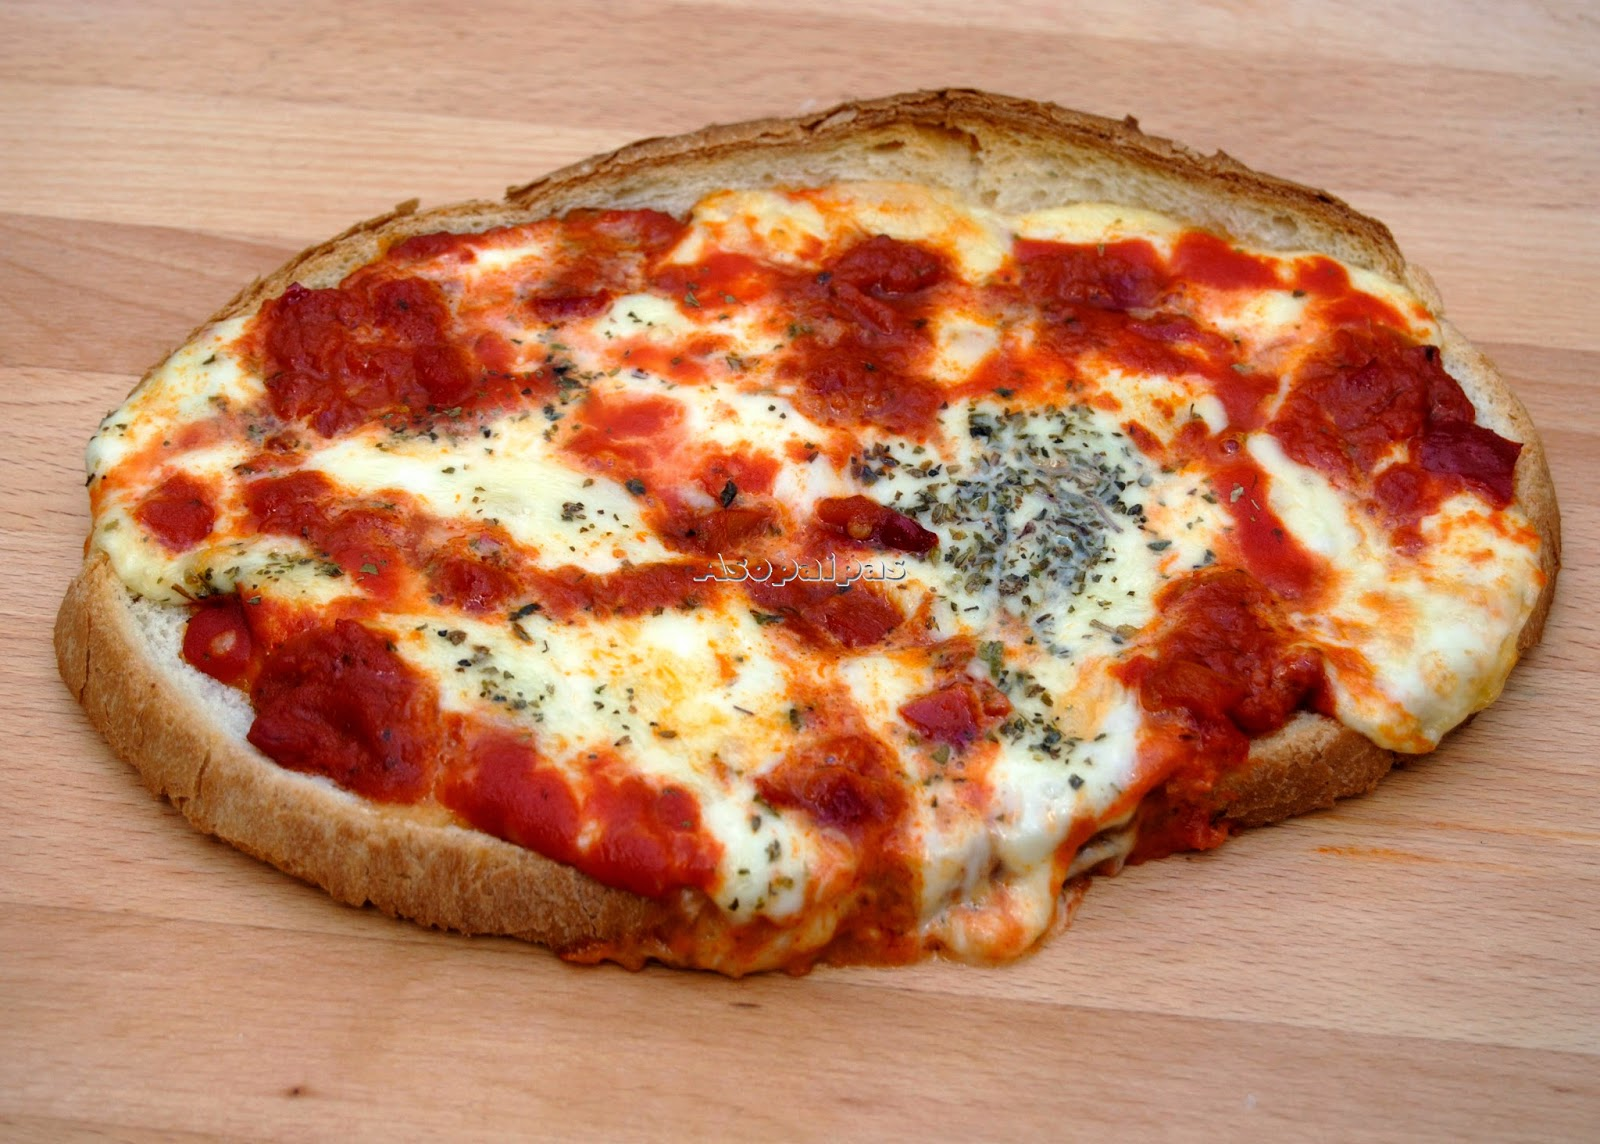 Bruschetta a la Pizzaiola